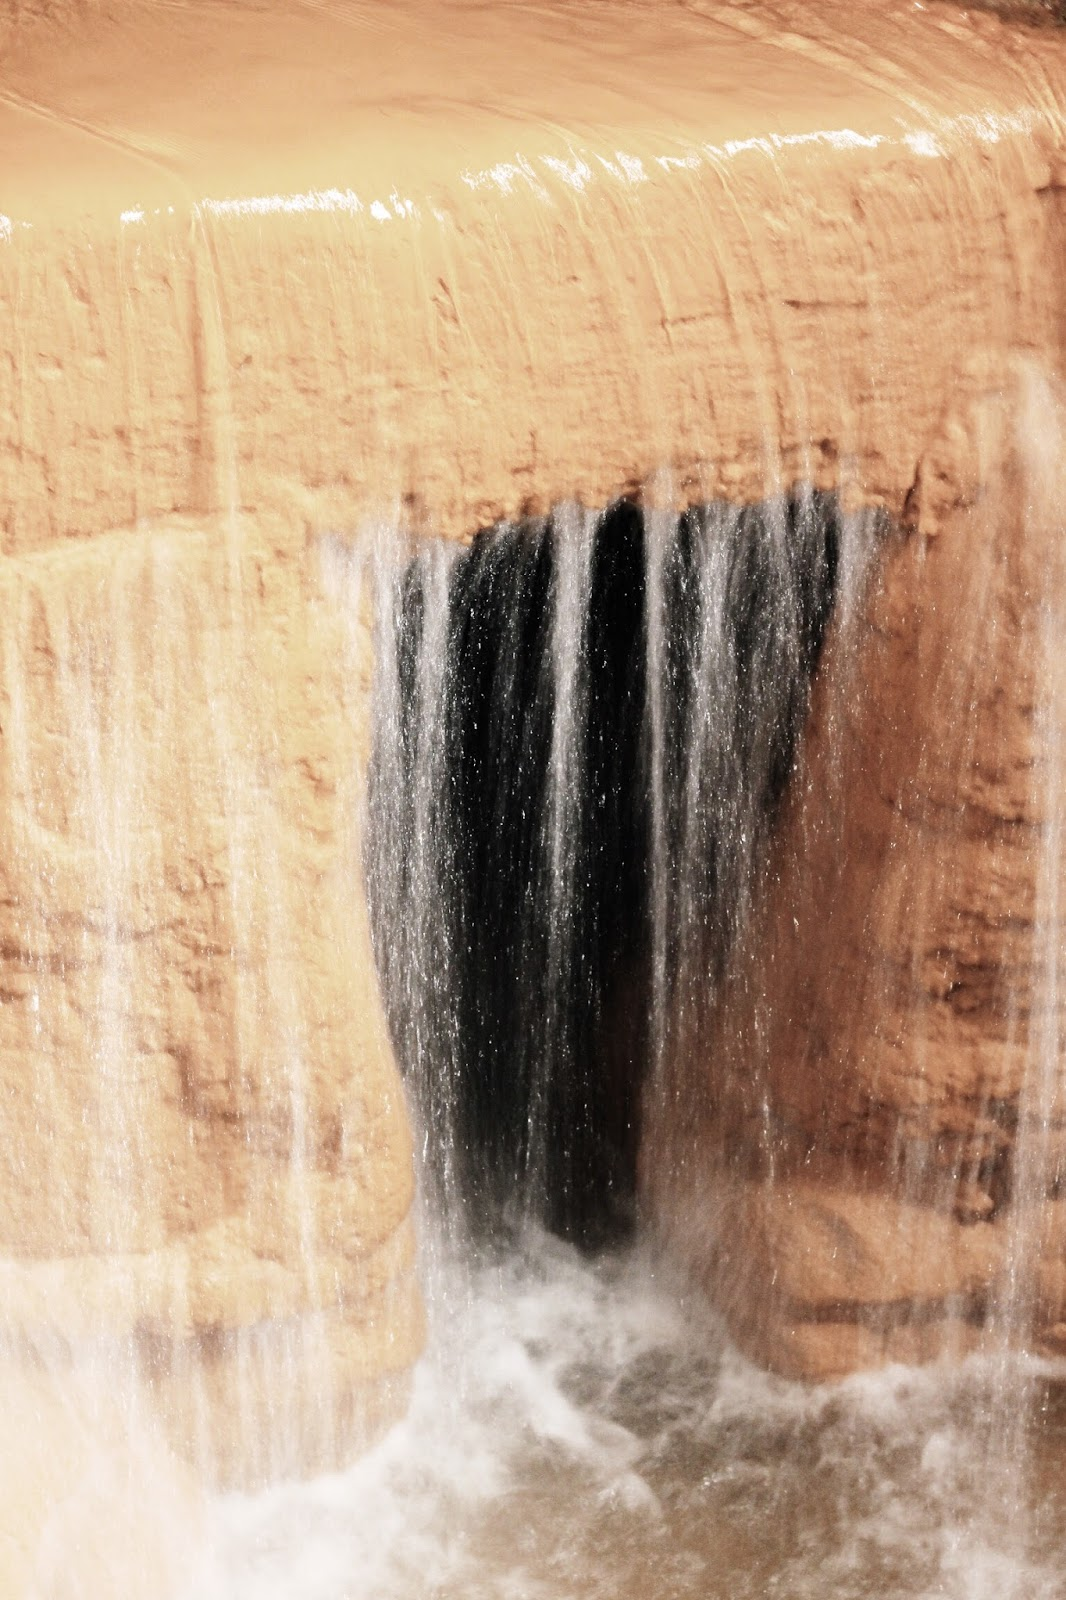 Untreated water at Roman Baths